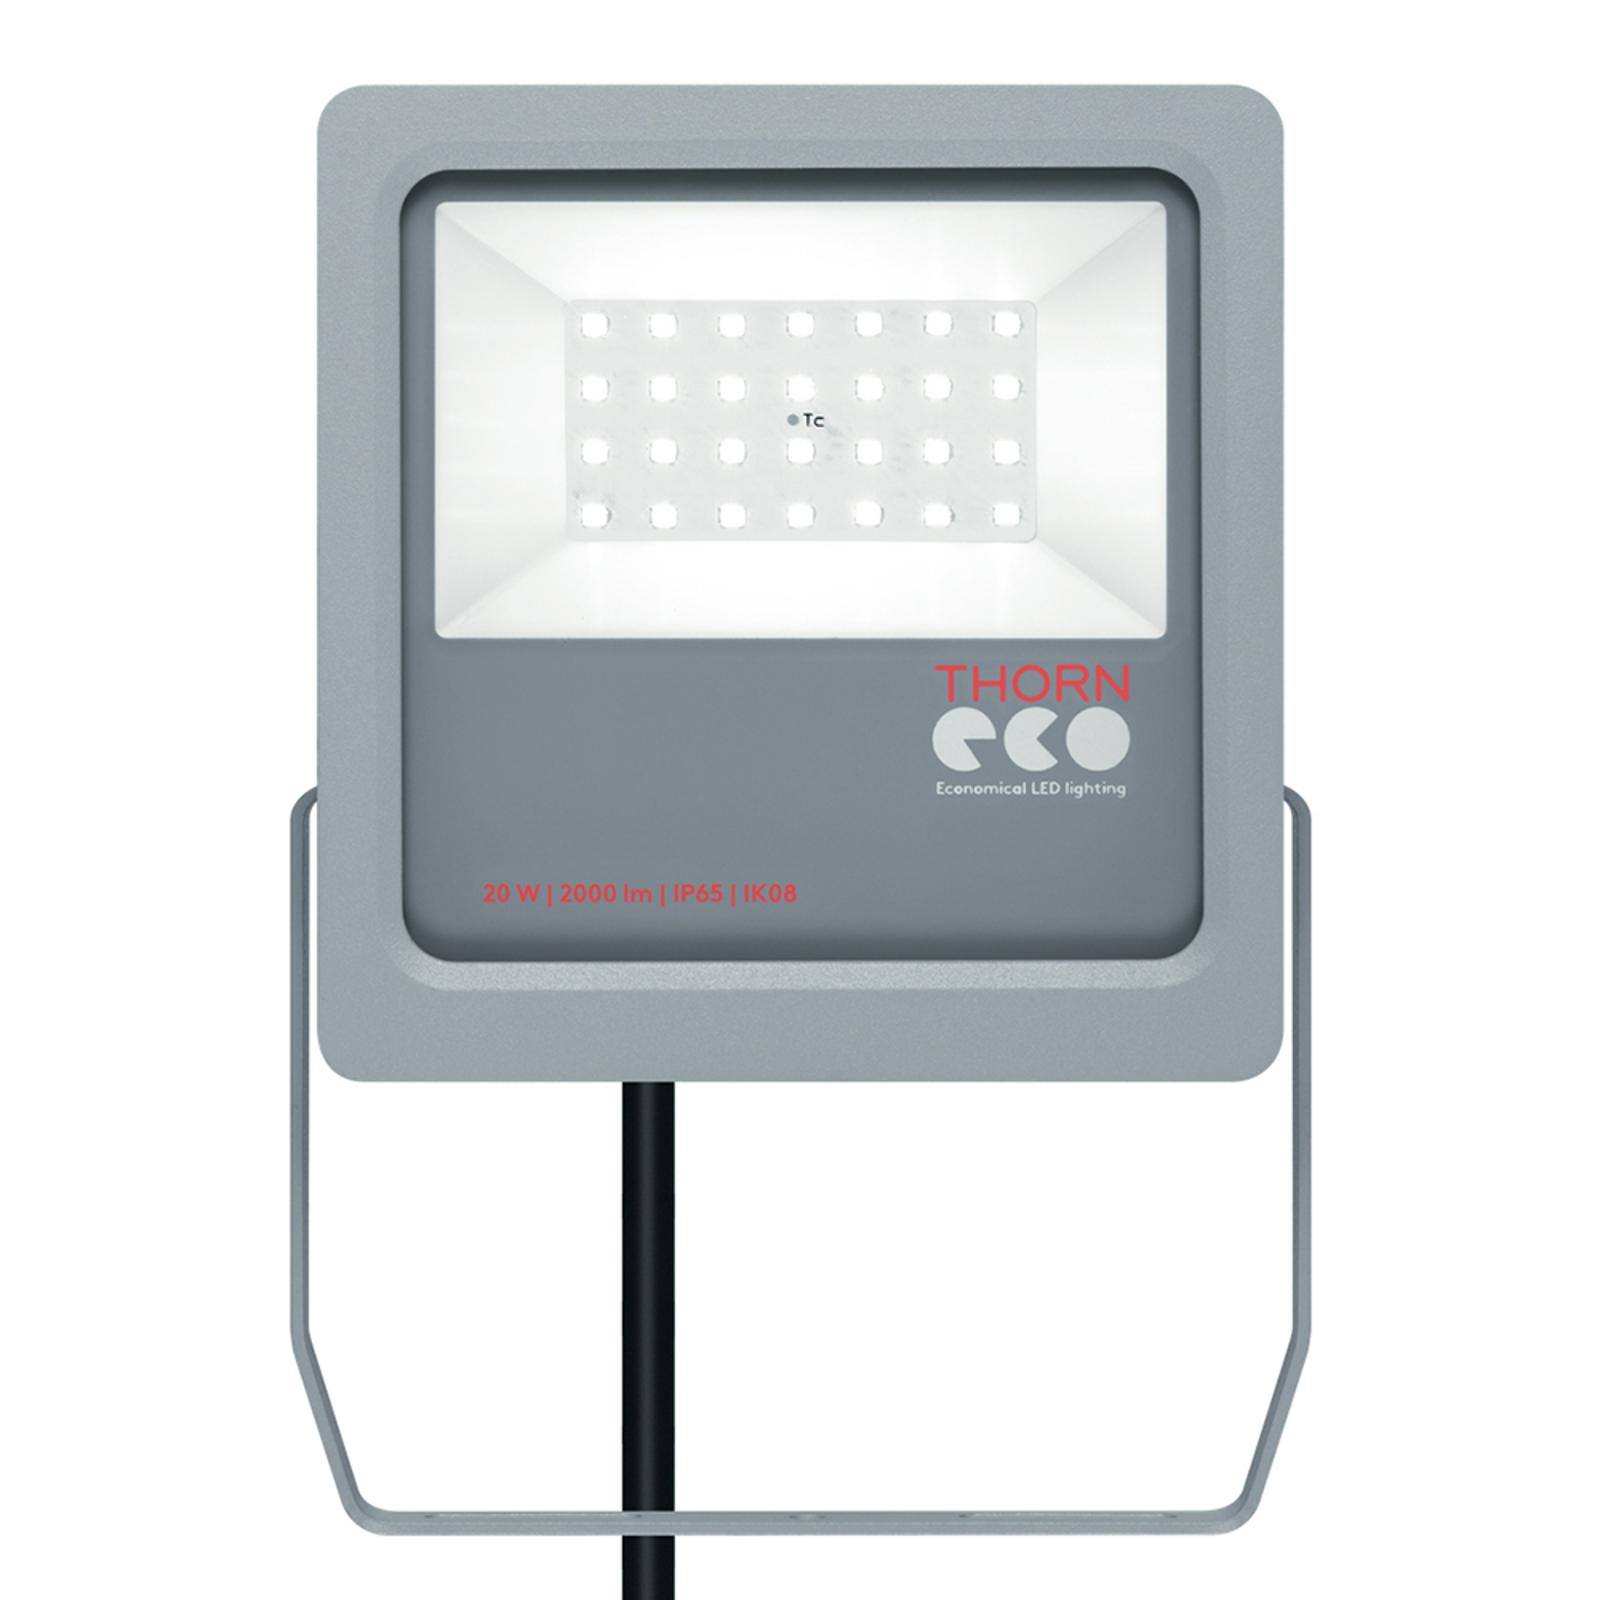 THORNeco Leonie LED-Strahler IP65 3.000 K 20 W